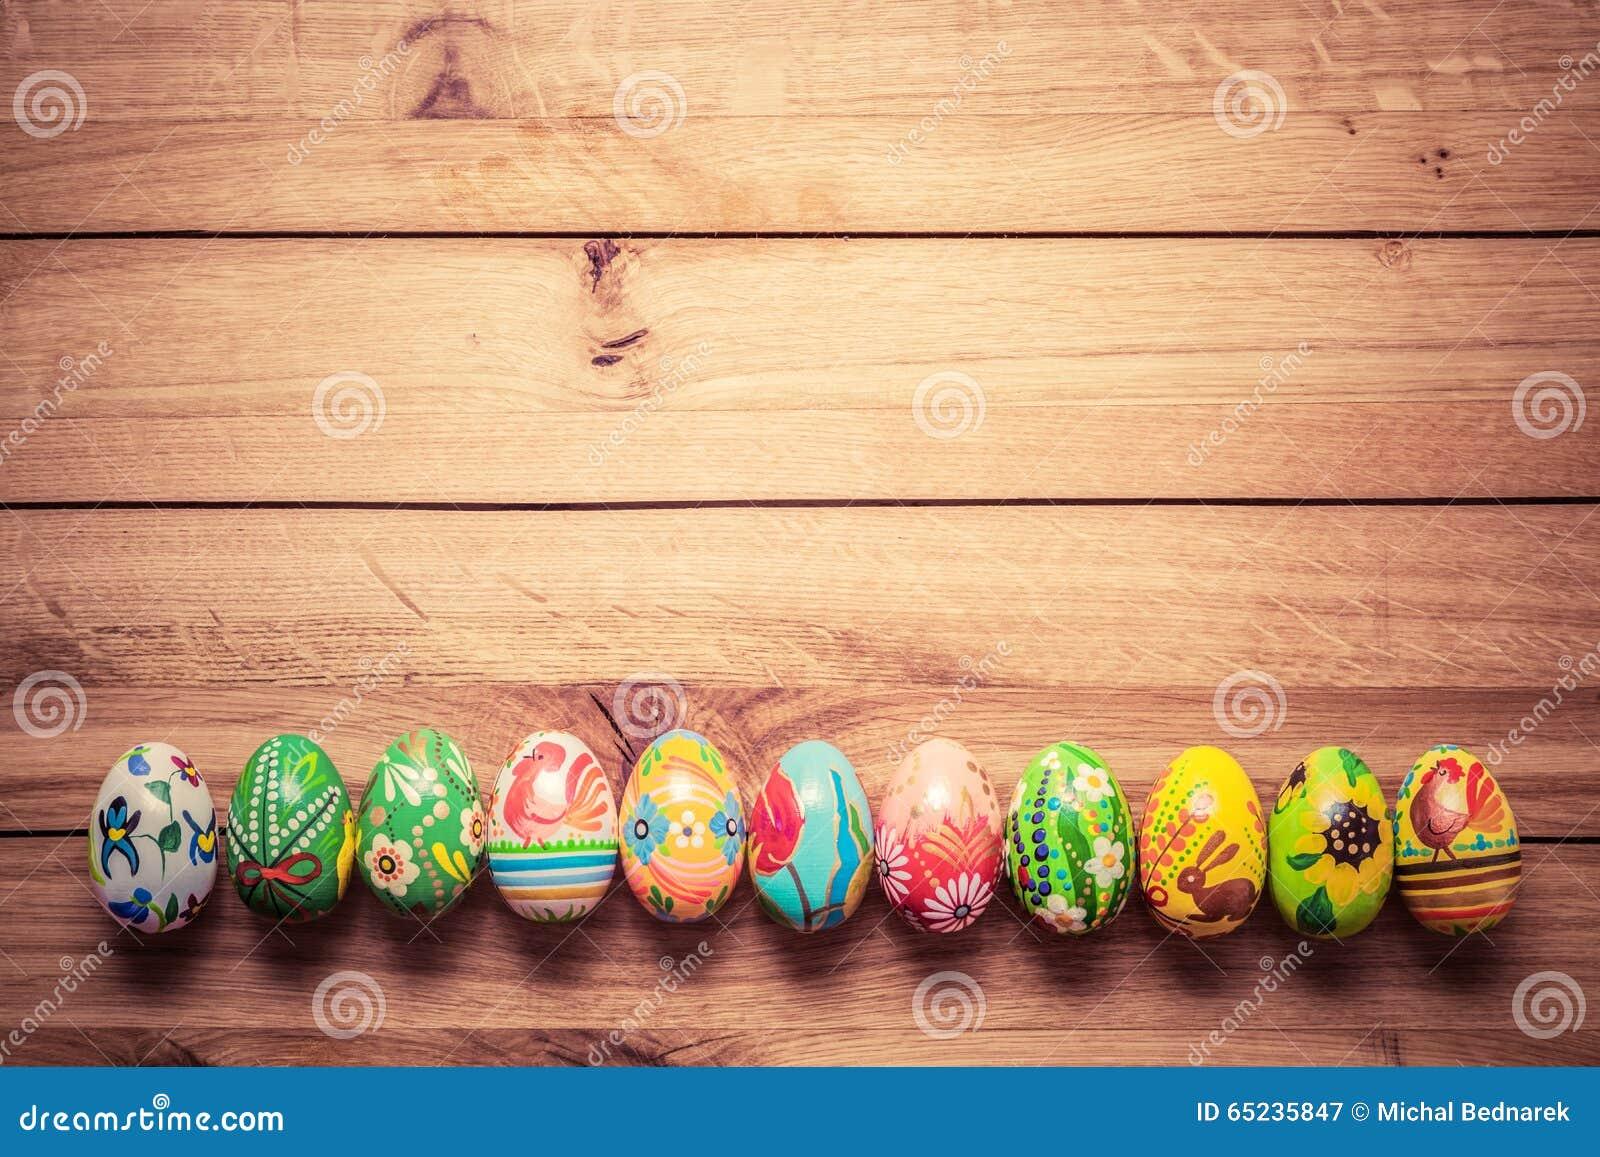 Vintage Hand Painted Wood Easter Eggs